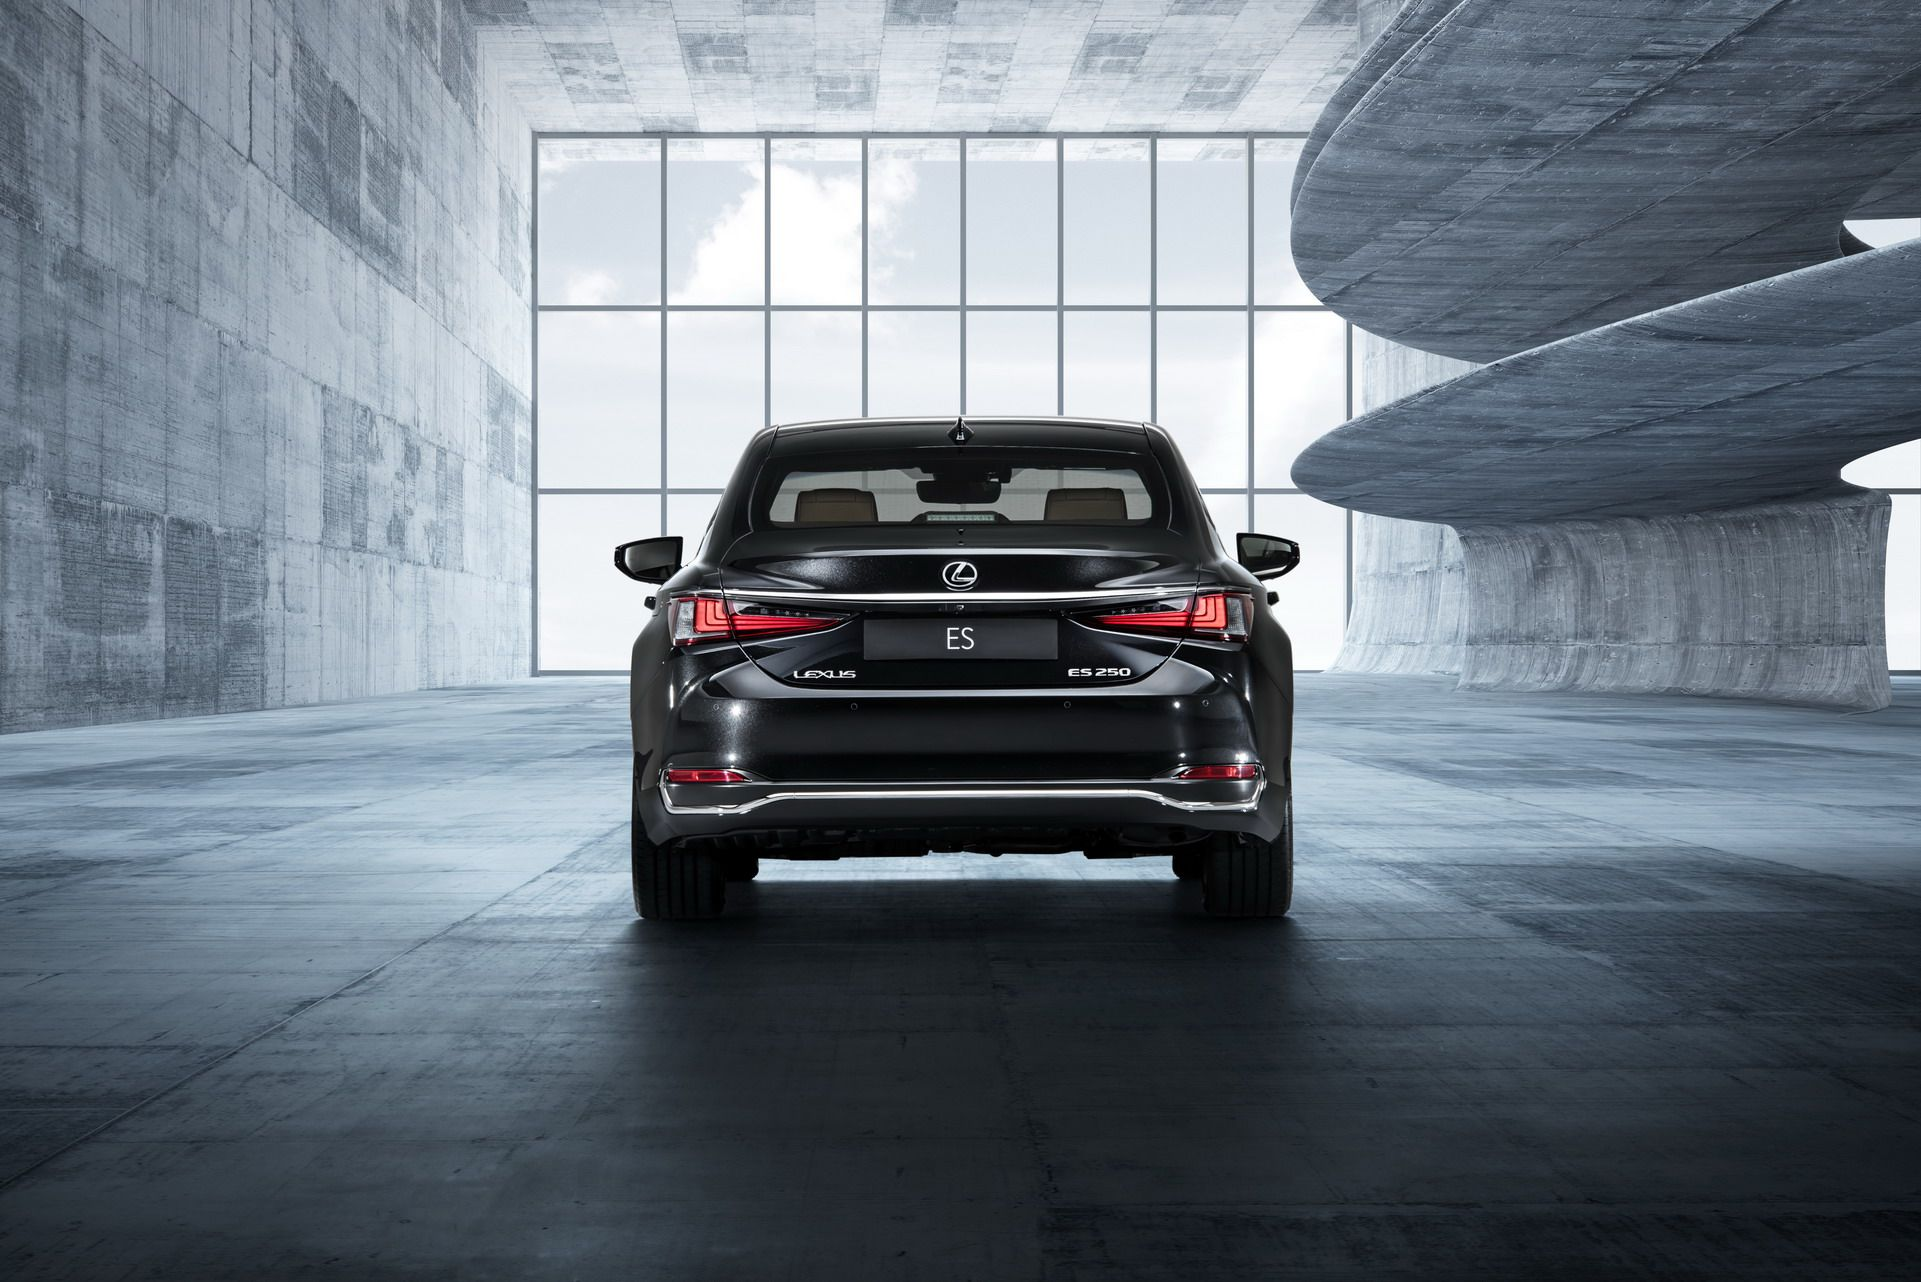 2019-Lexus-ES-EU29